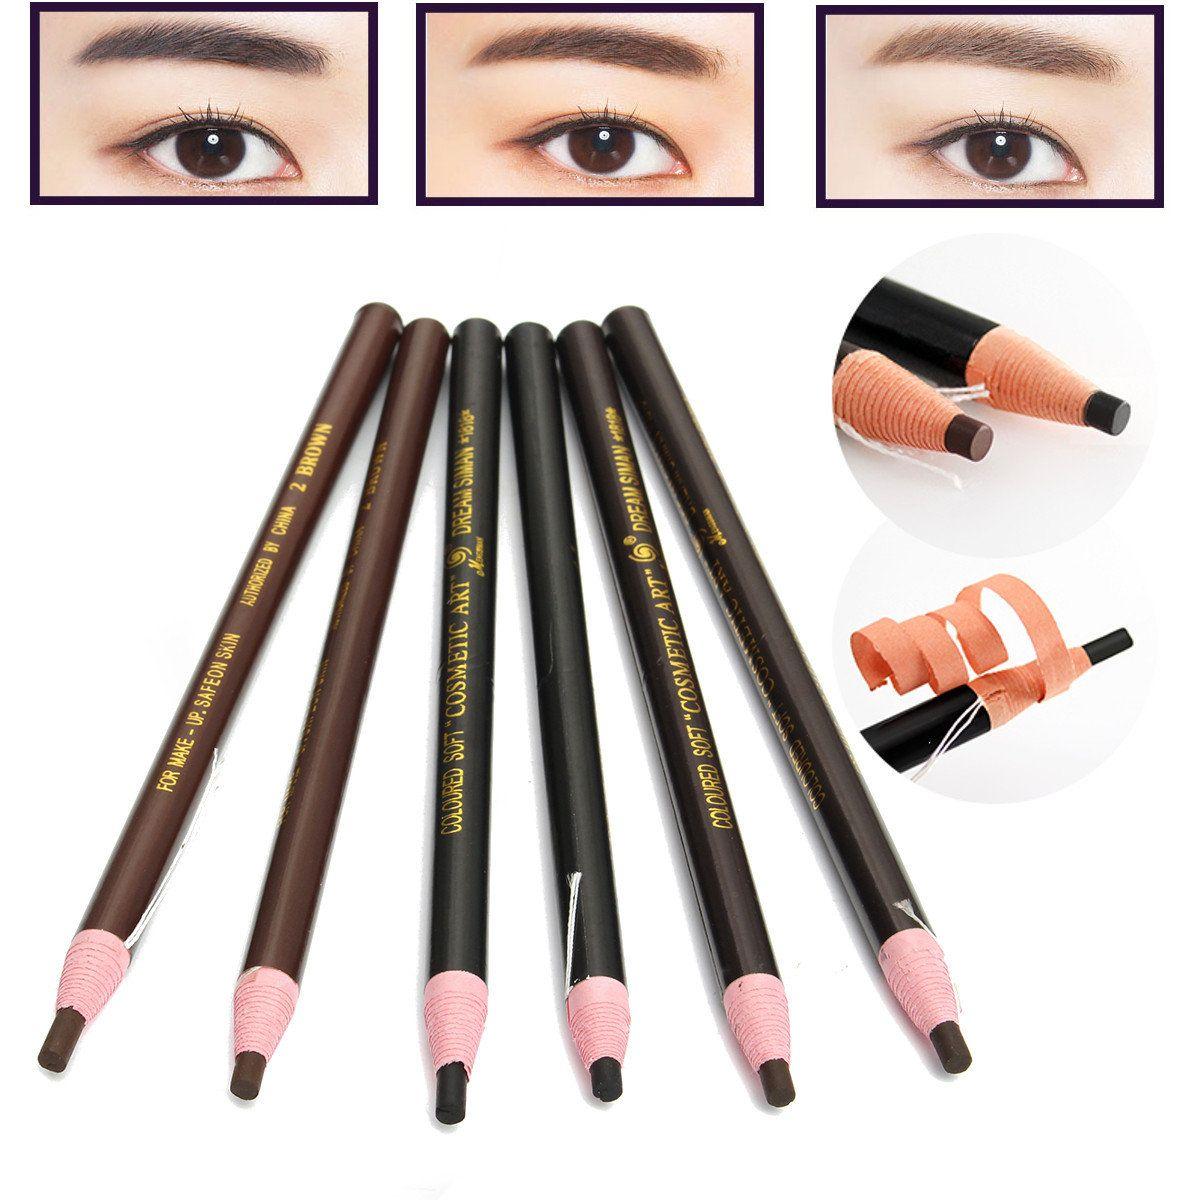 12pcs Eyebrow Pencil Eyeliner Set Waterproof Eye Makeup Pen Cosmetic